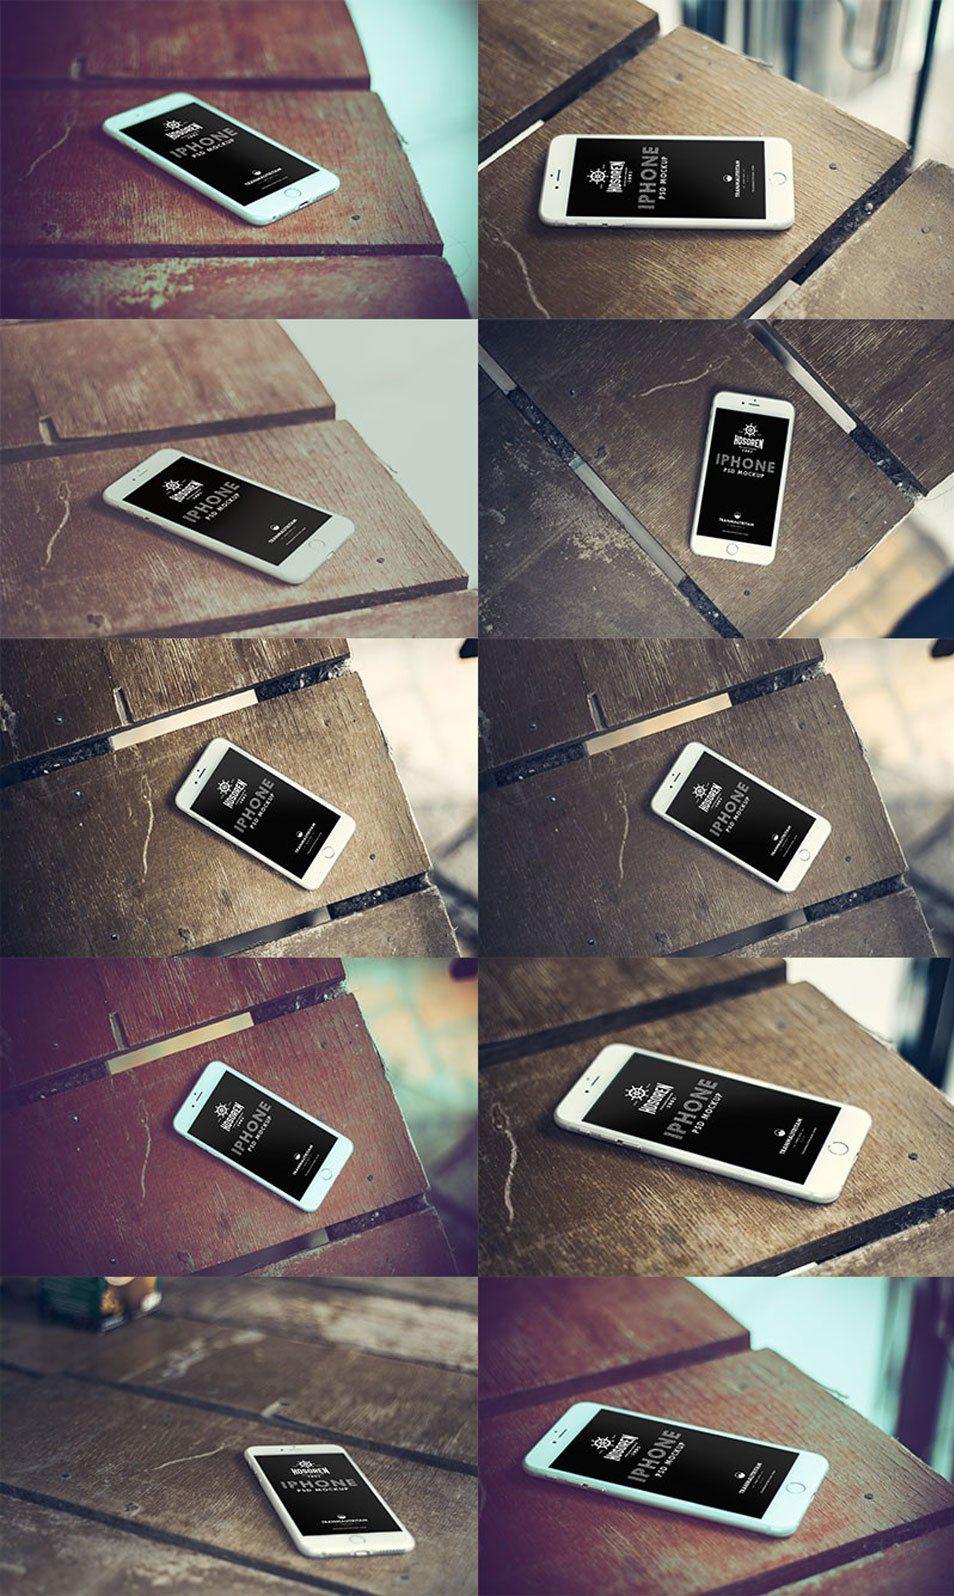 500 Free Mockup Templates Psd Designs Css Author Mockup Free Psd Iphone Mockup Photoshop Mockup Free